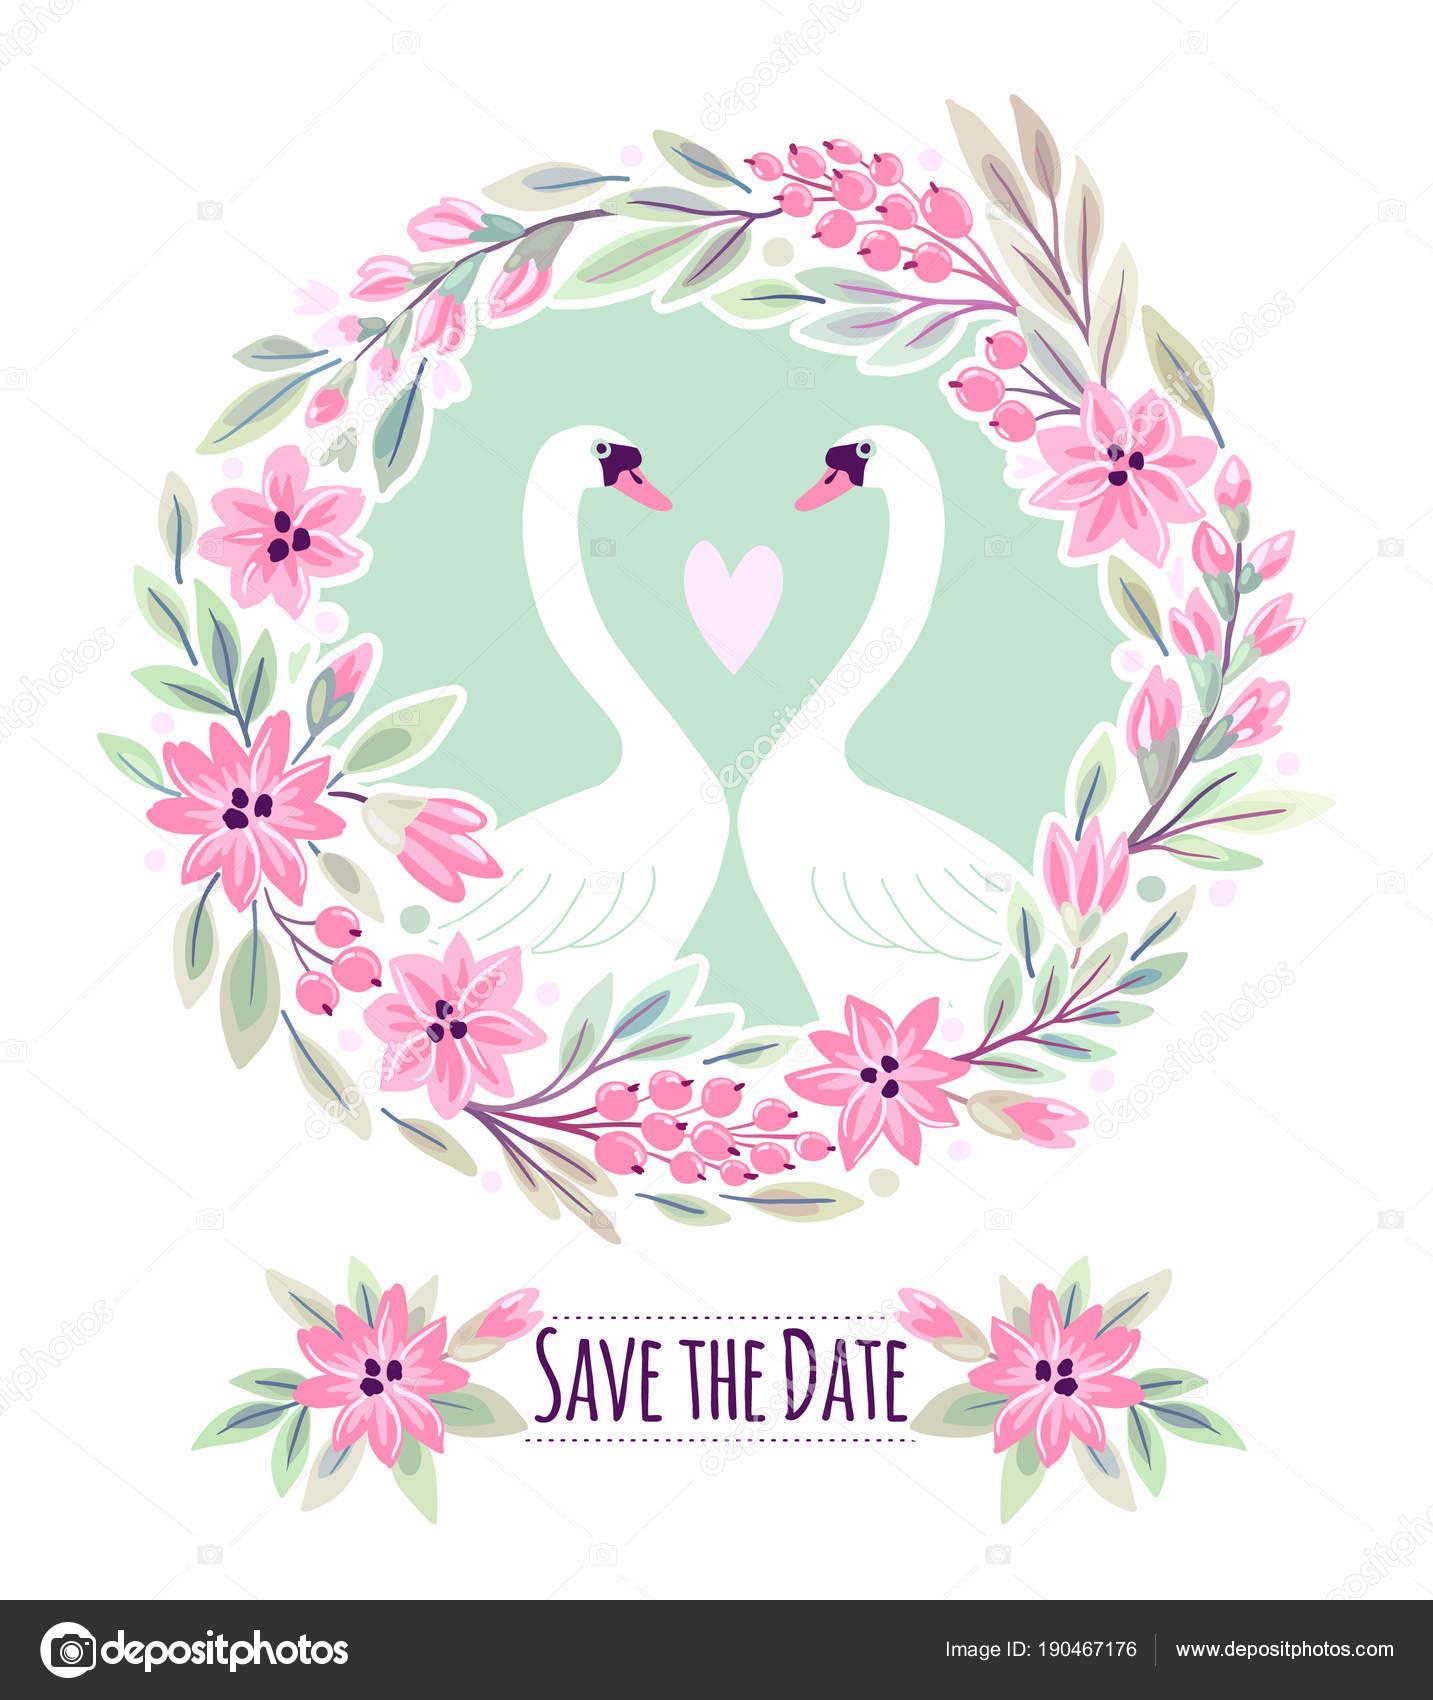 Wedding invitation pink flowers swans vector illustration freehand wedding invitation pink flowers swans vector illustration freehand drawing stock vector stopboris Images